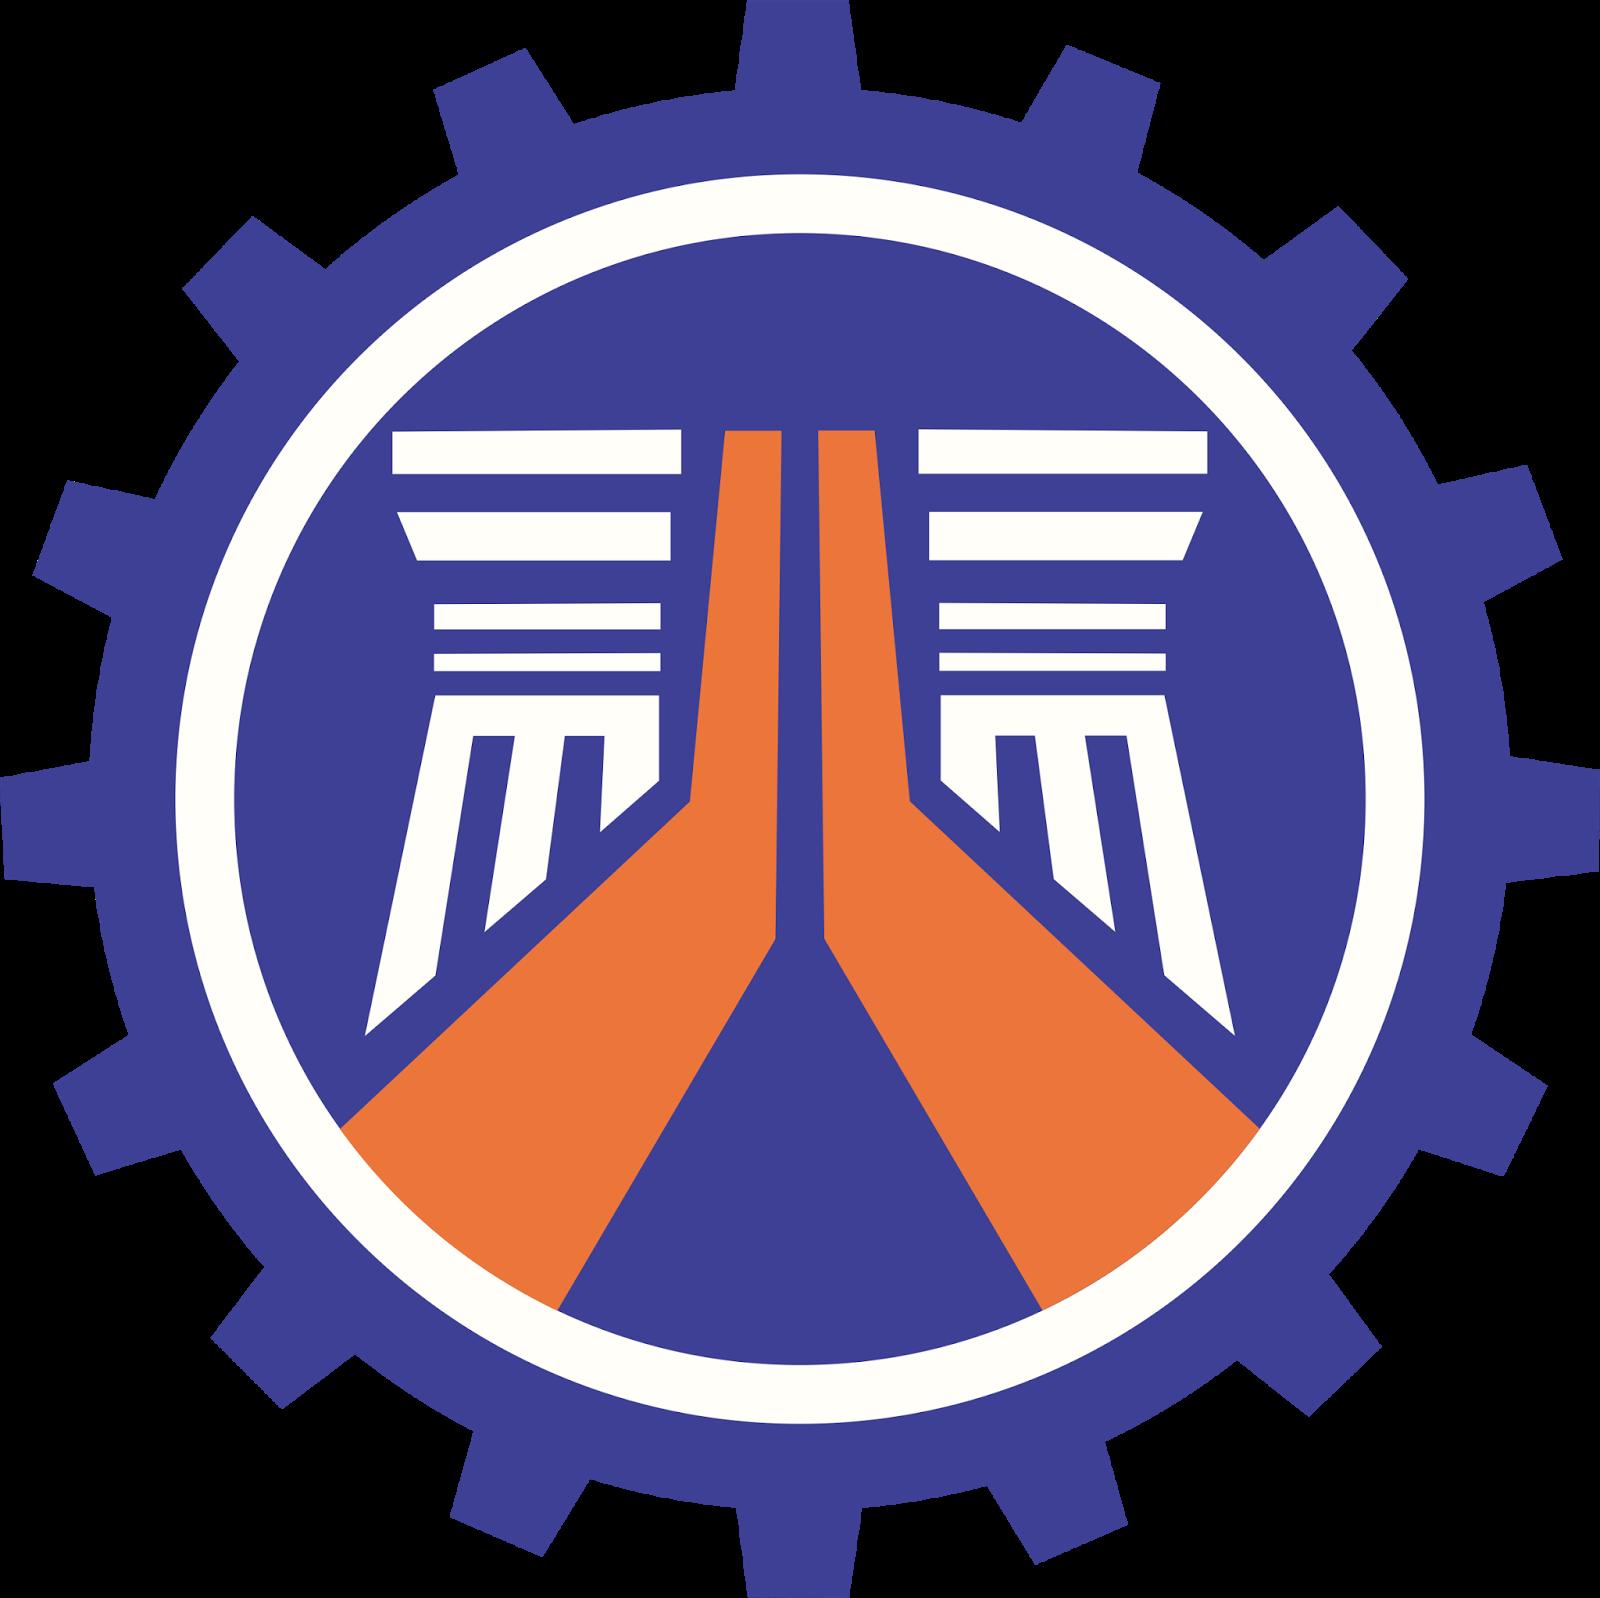 Dpwh Logos.